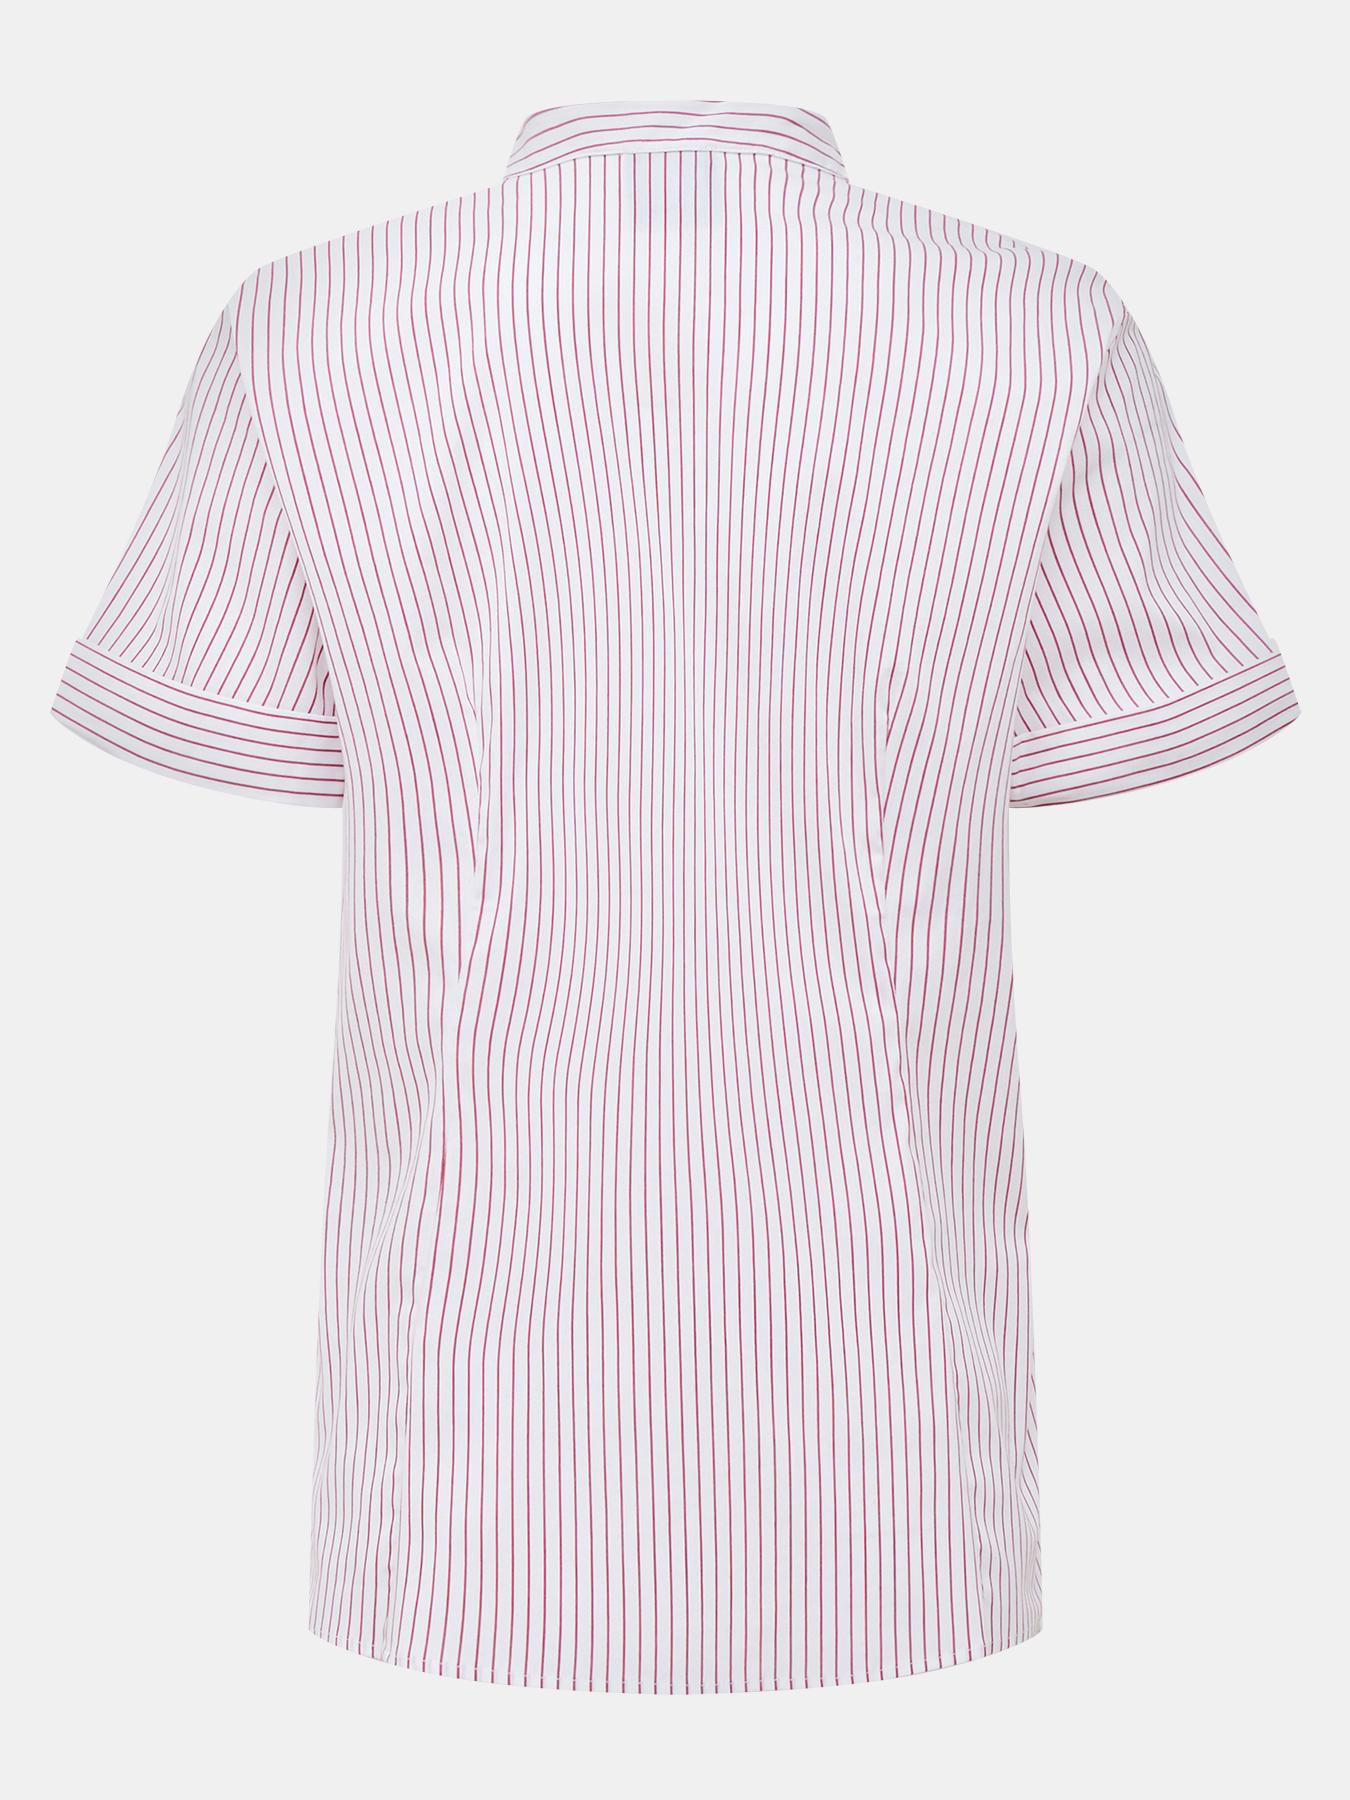 Блузка Persona by Marina Rinaldi Рубашка plus size